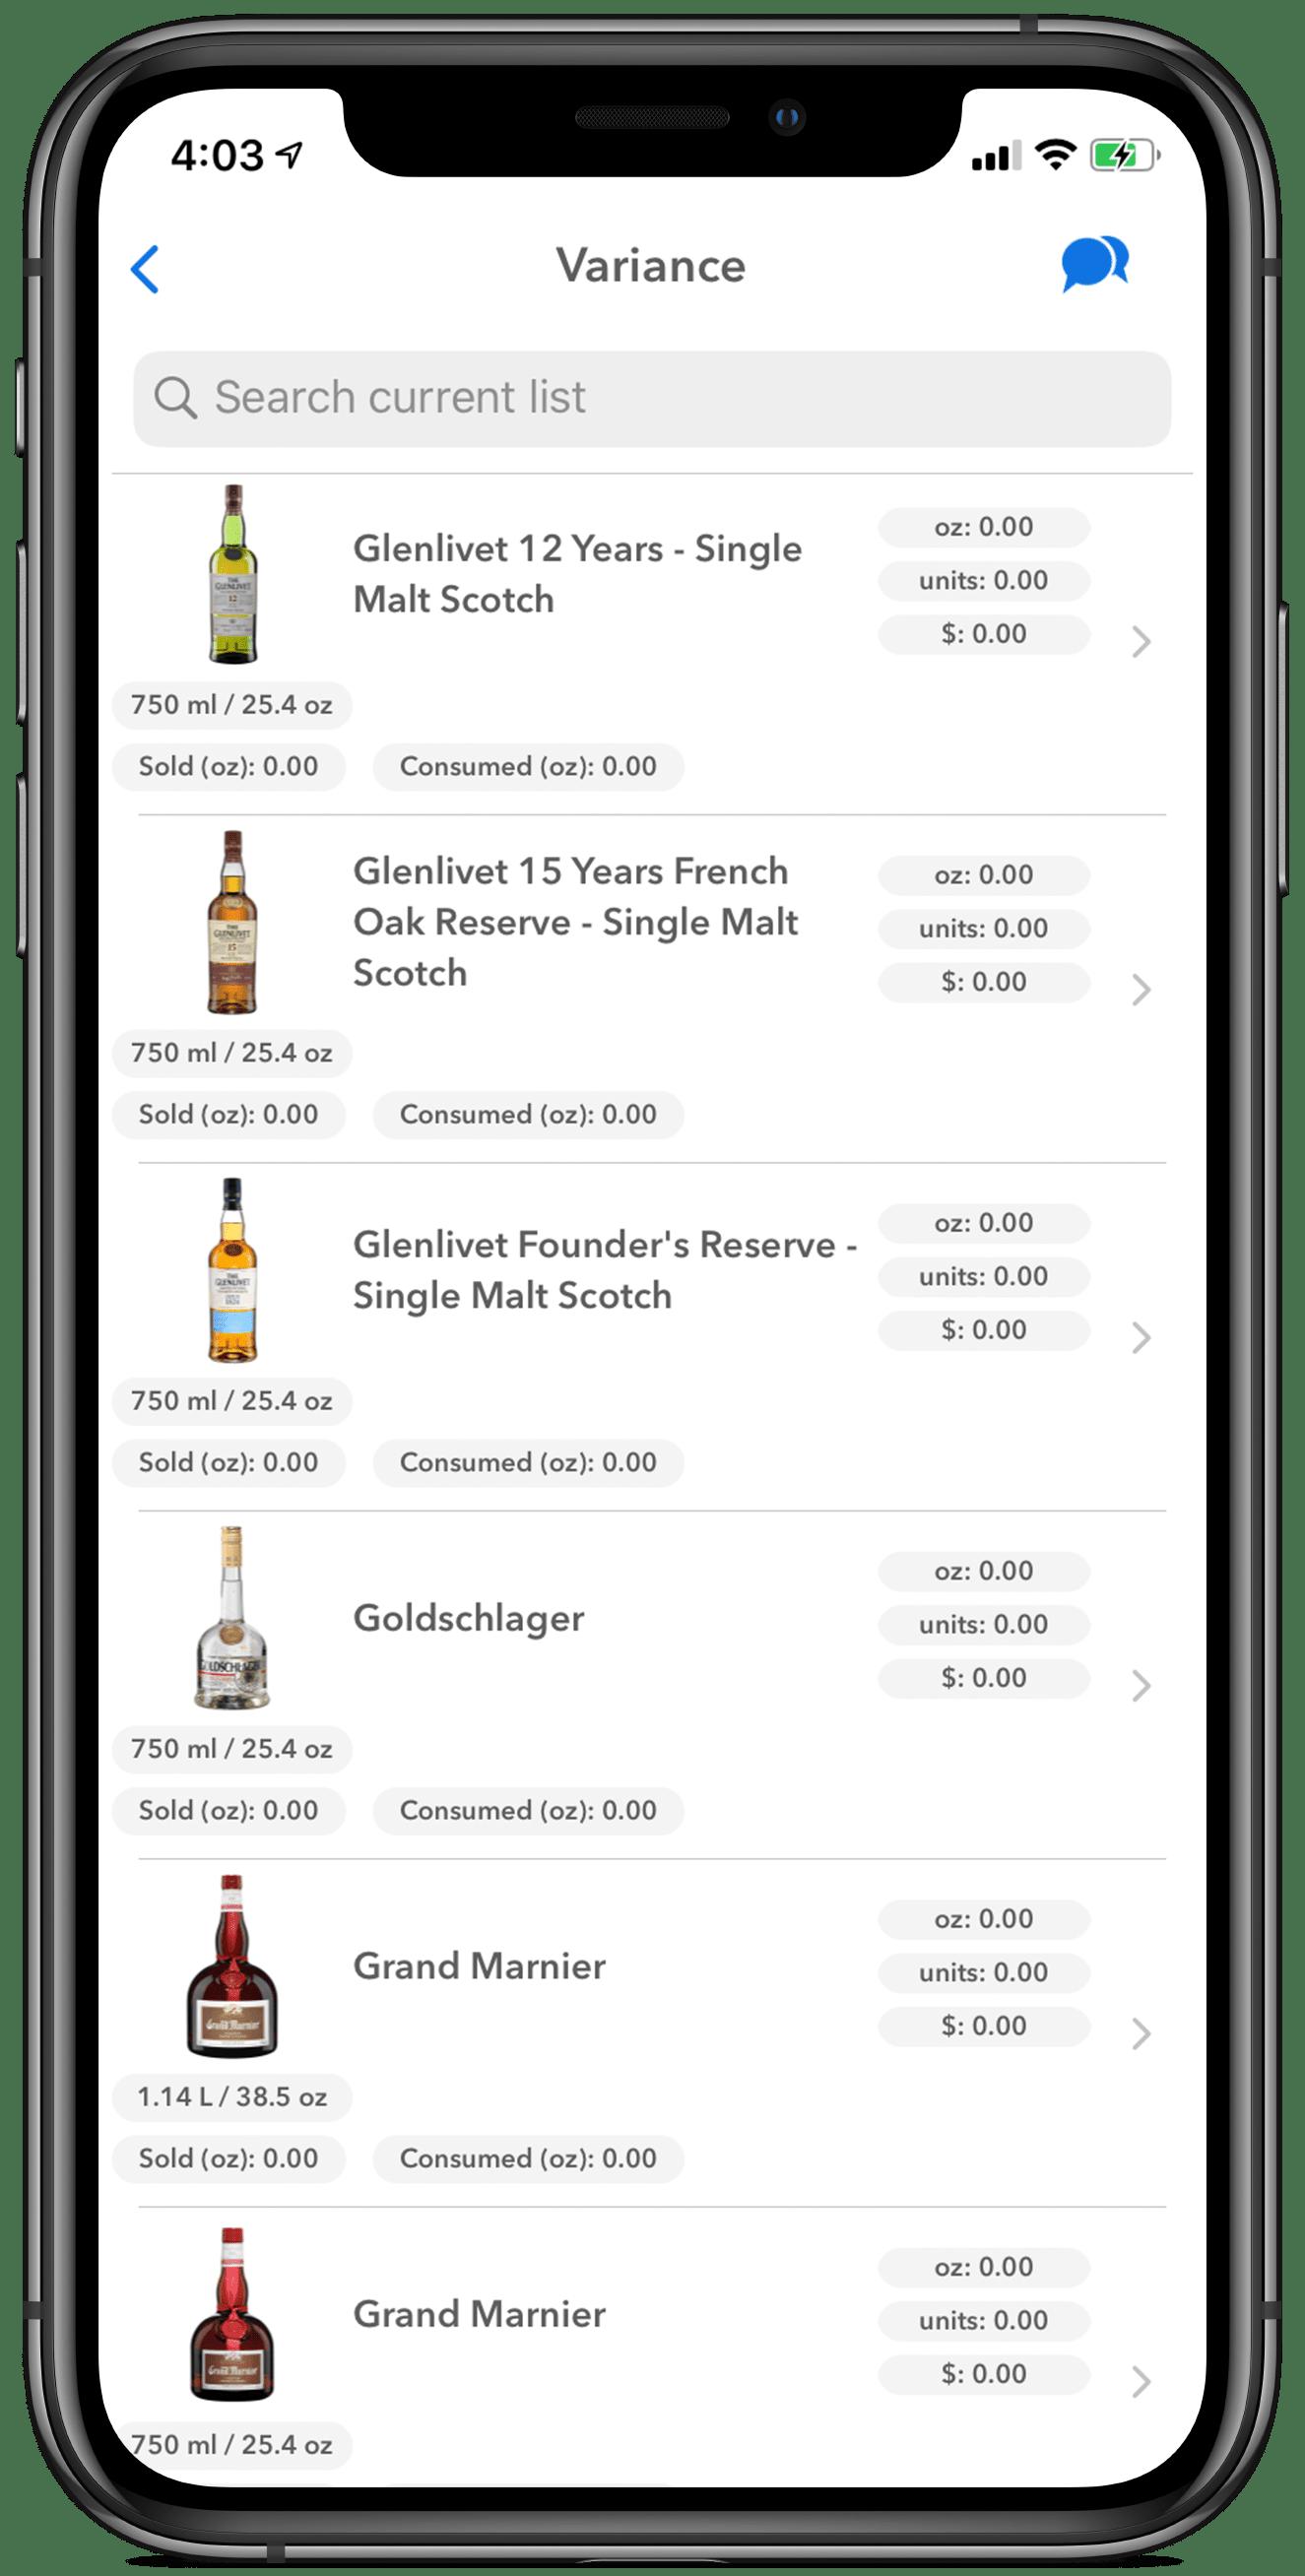 iphone screen, variance, liquor bottles, partender vs bevinco, wisk